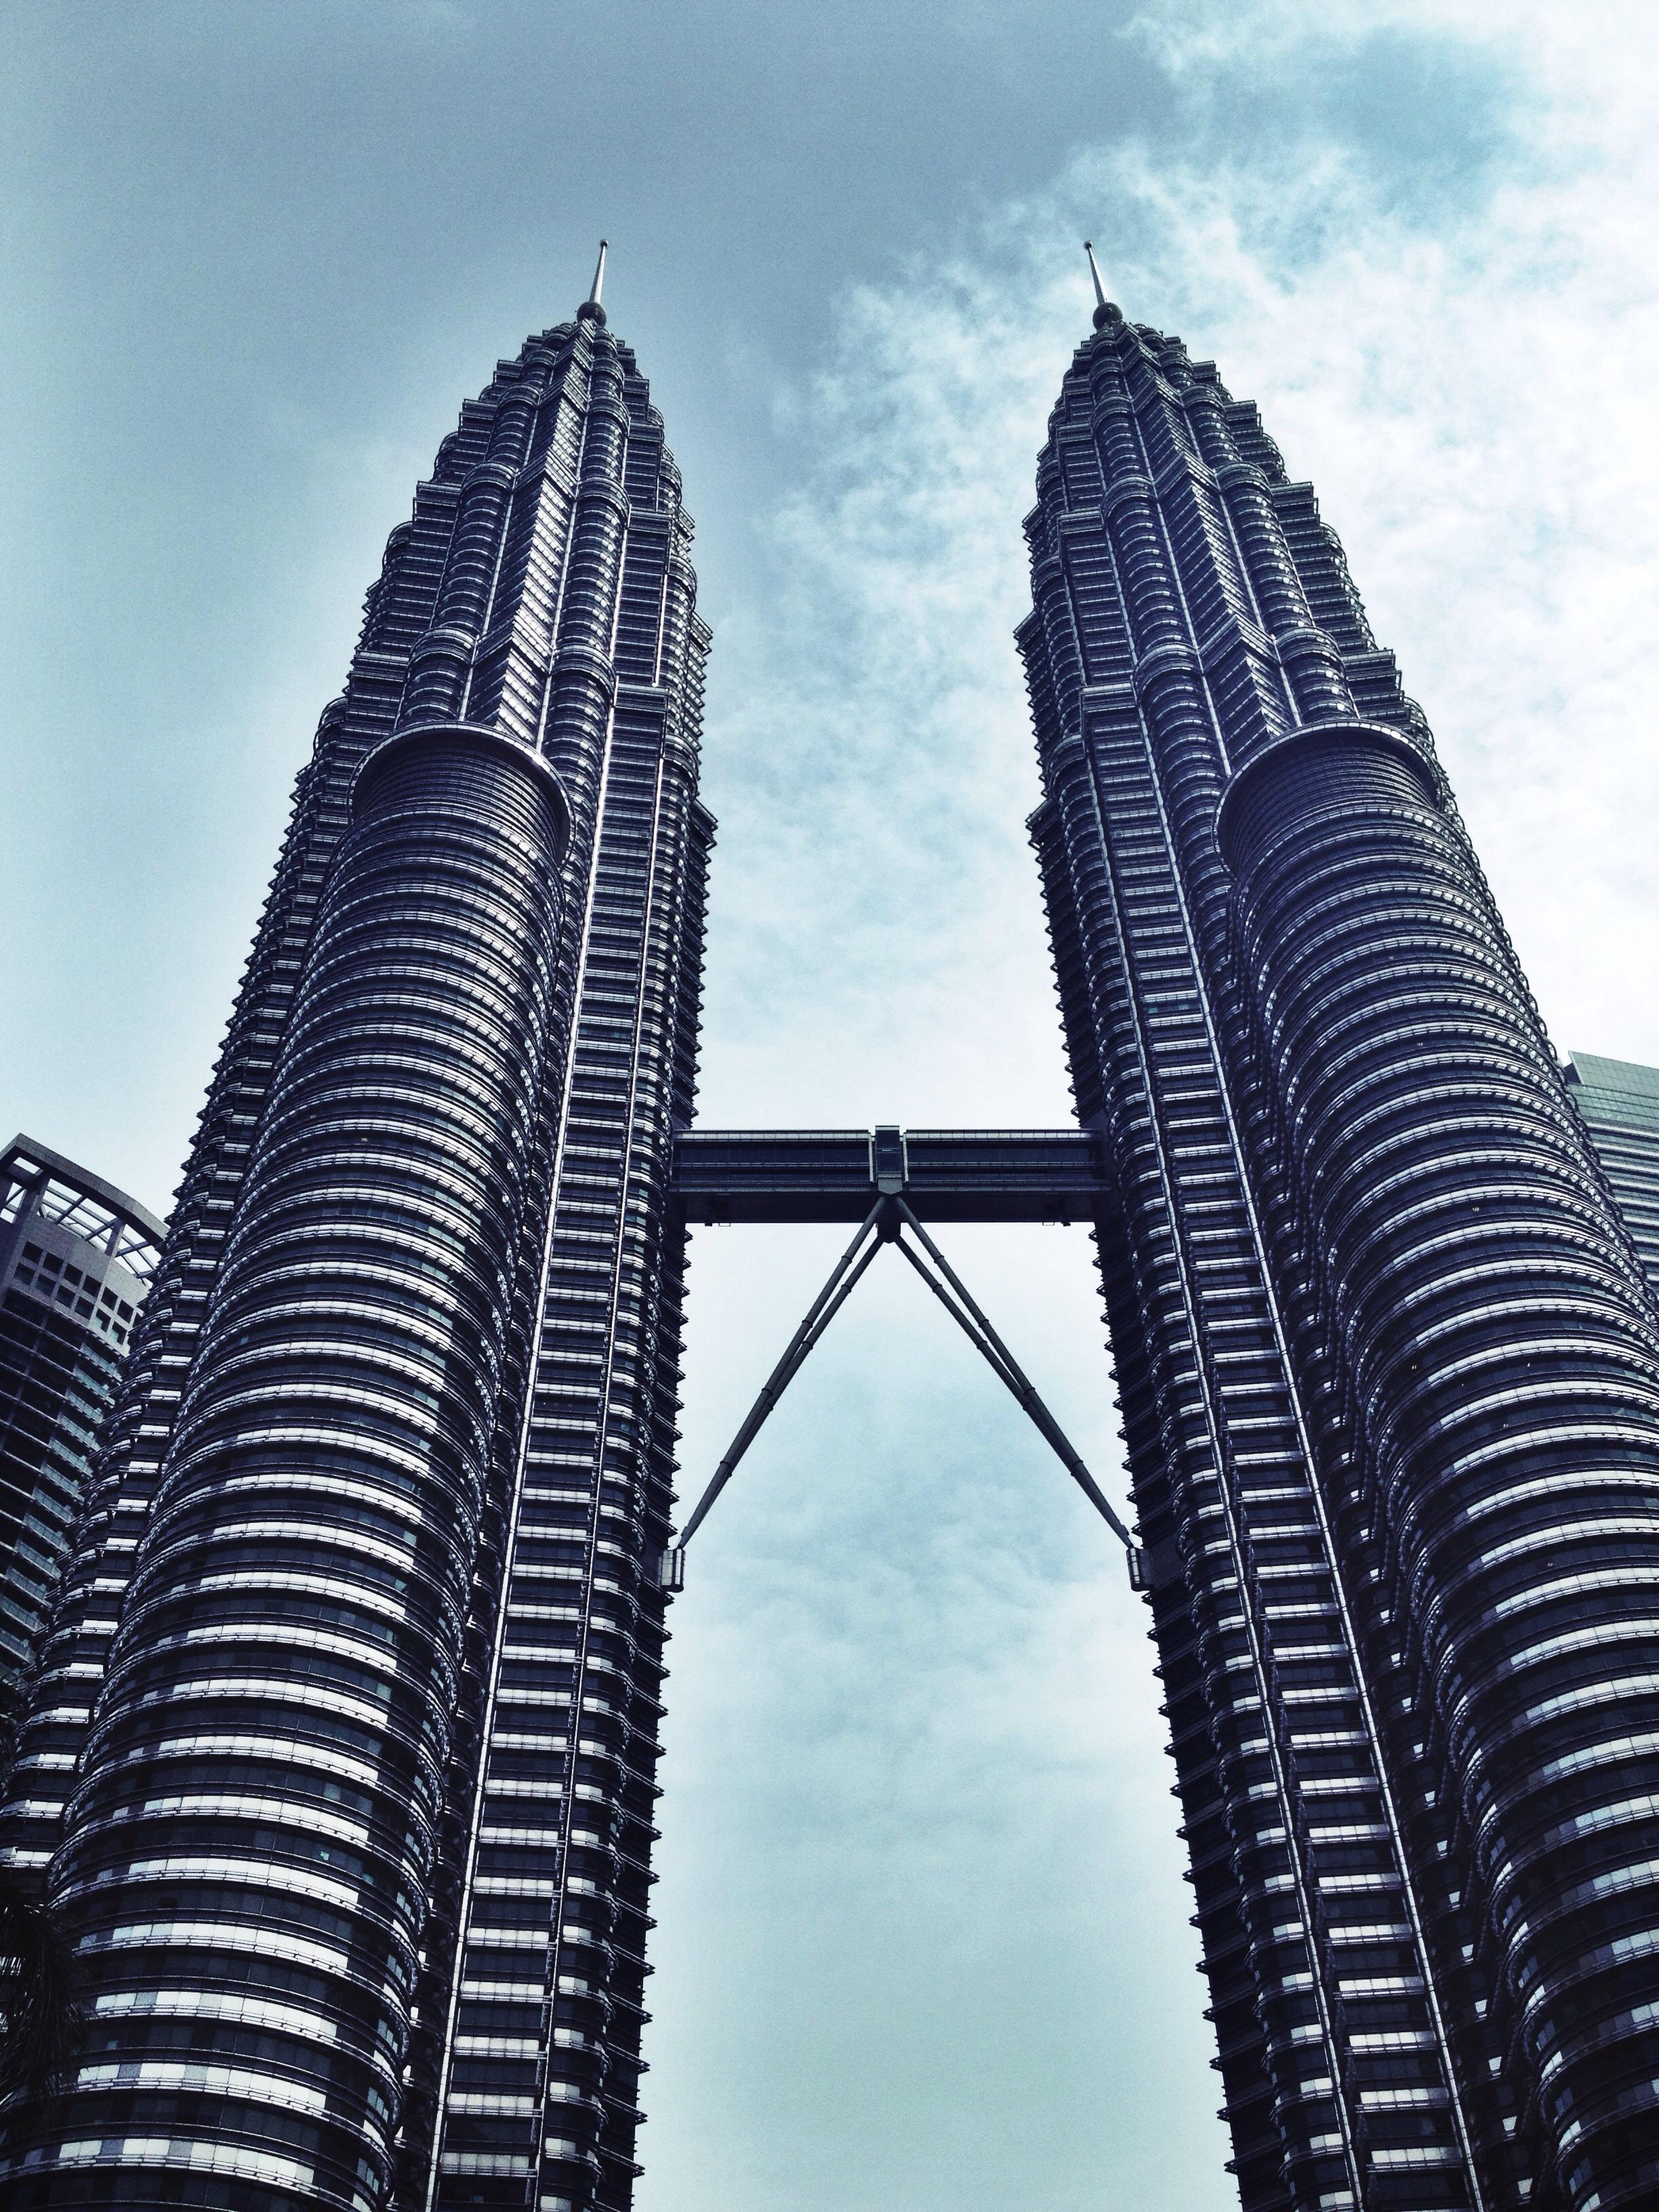 Petronas Towers in Kuala Lumpur, Malaysia | Natalia Zurowski